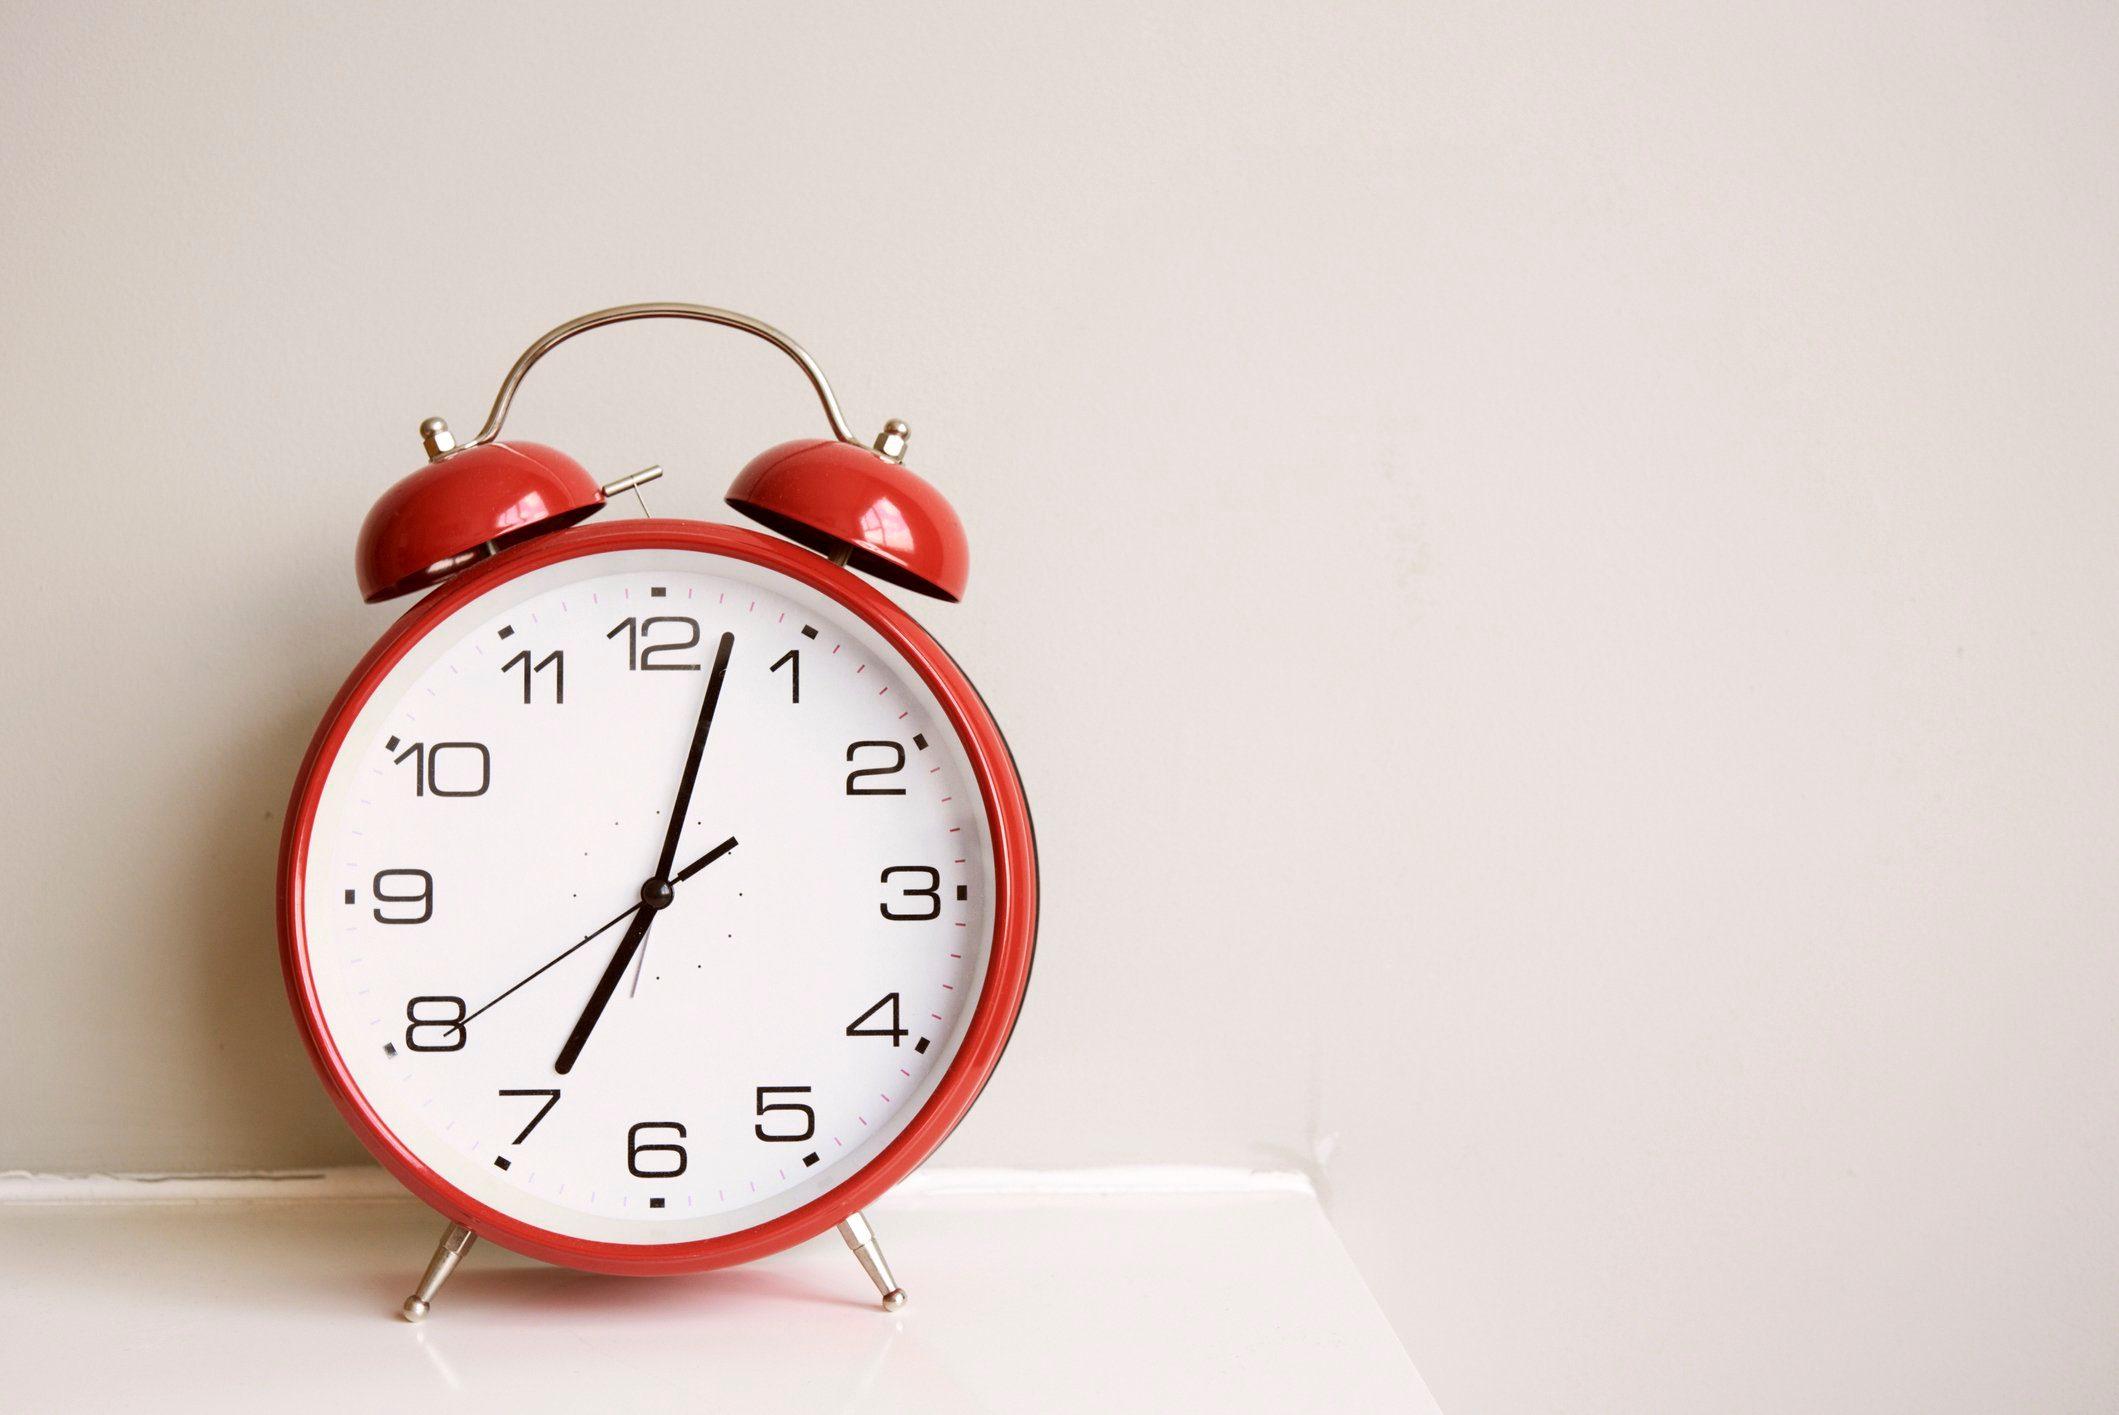 doctors eat for breakfast | alarm clock on bedside table